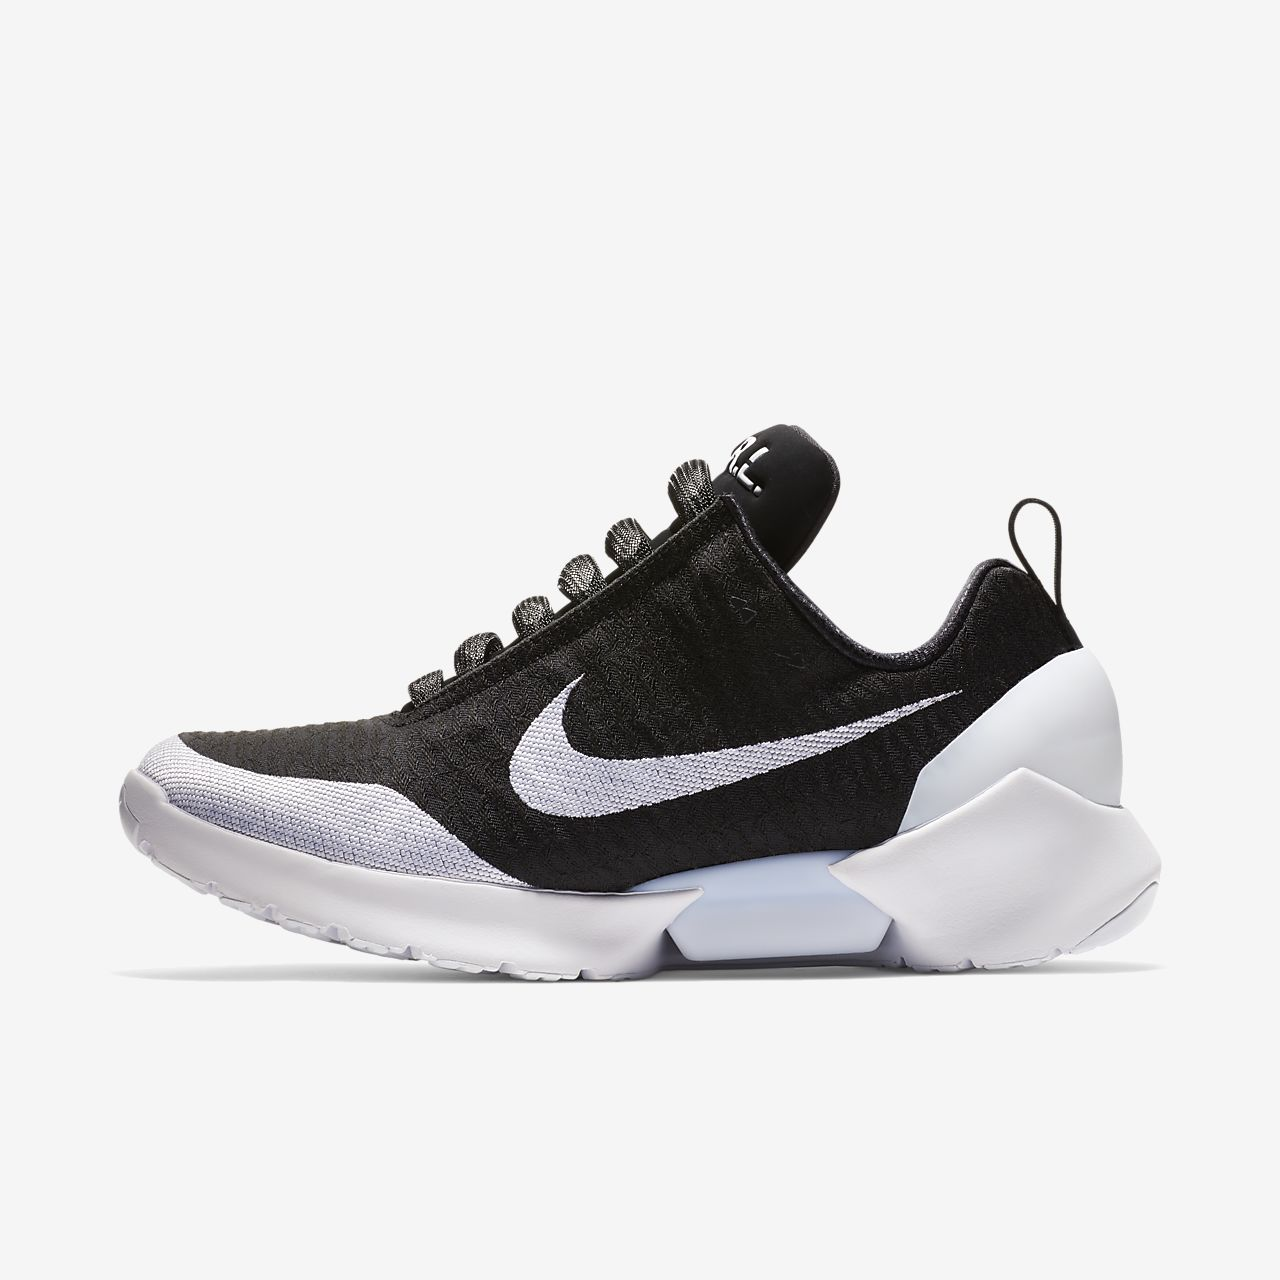 huge discount a9f23 22c38 ... Nike HyperAdapt 1.0 (UK Plug) Mens Shoe